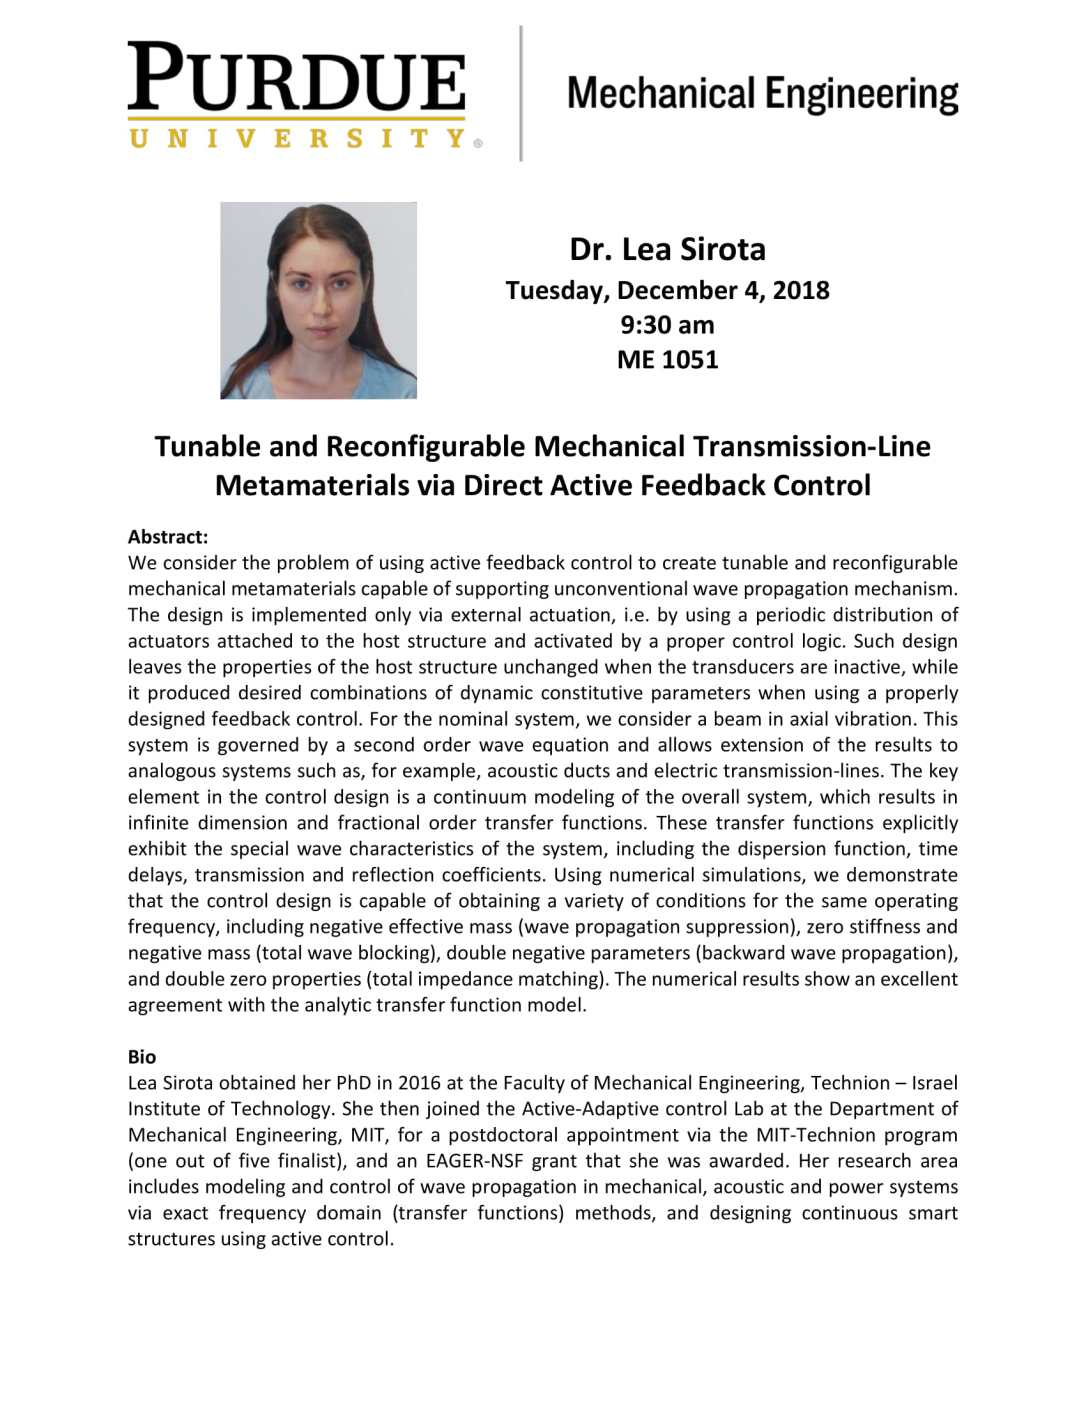 Lea Sirota seminar announcement-1